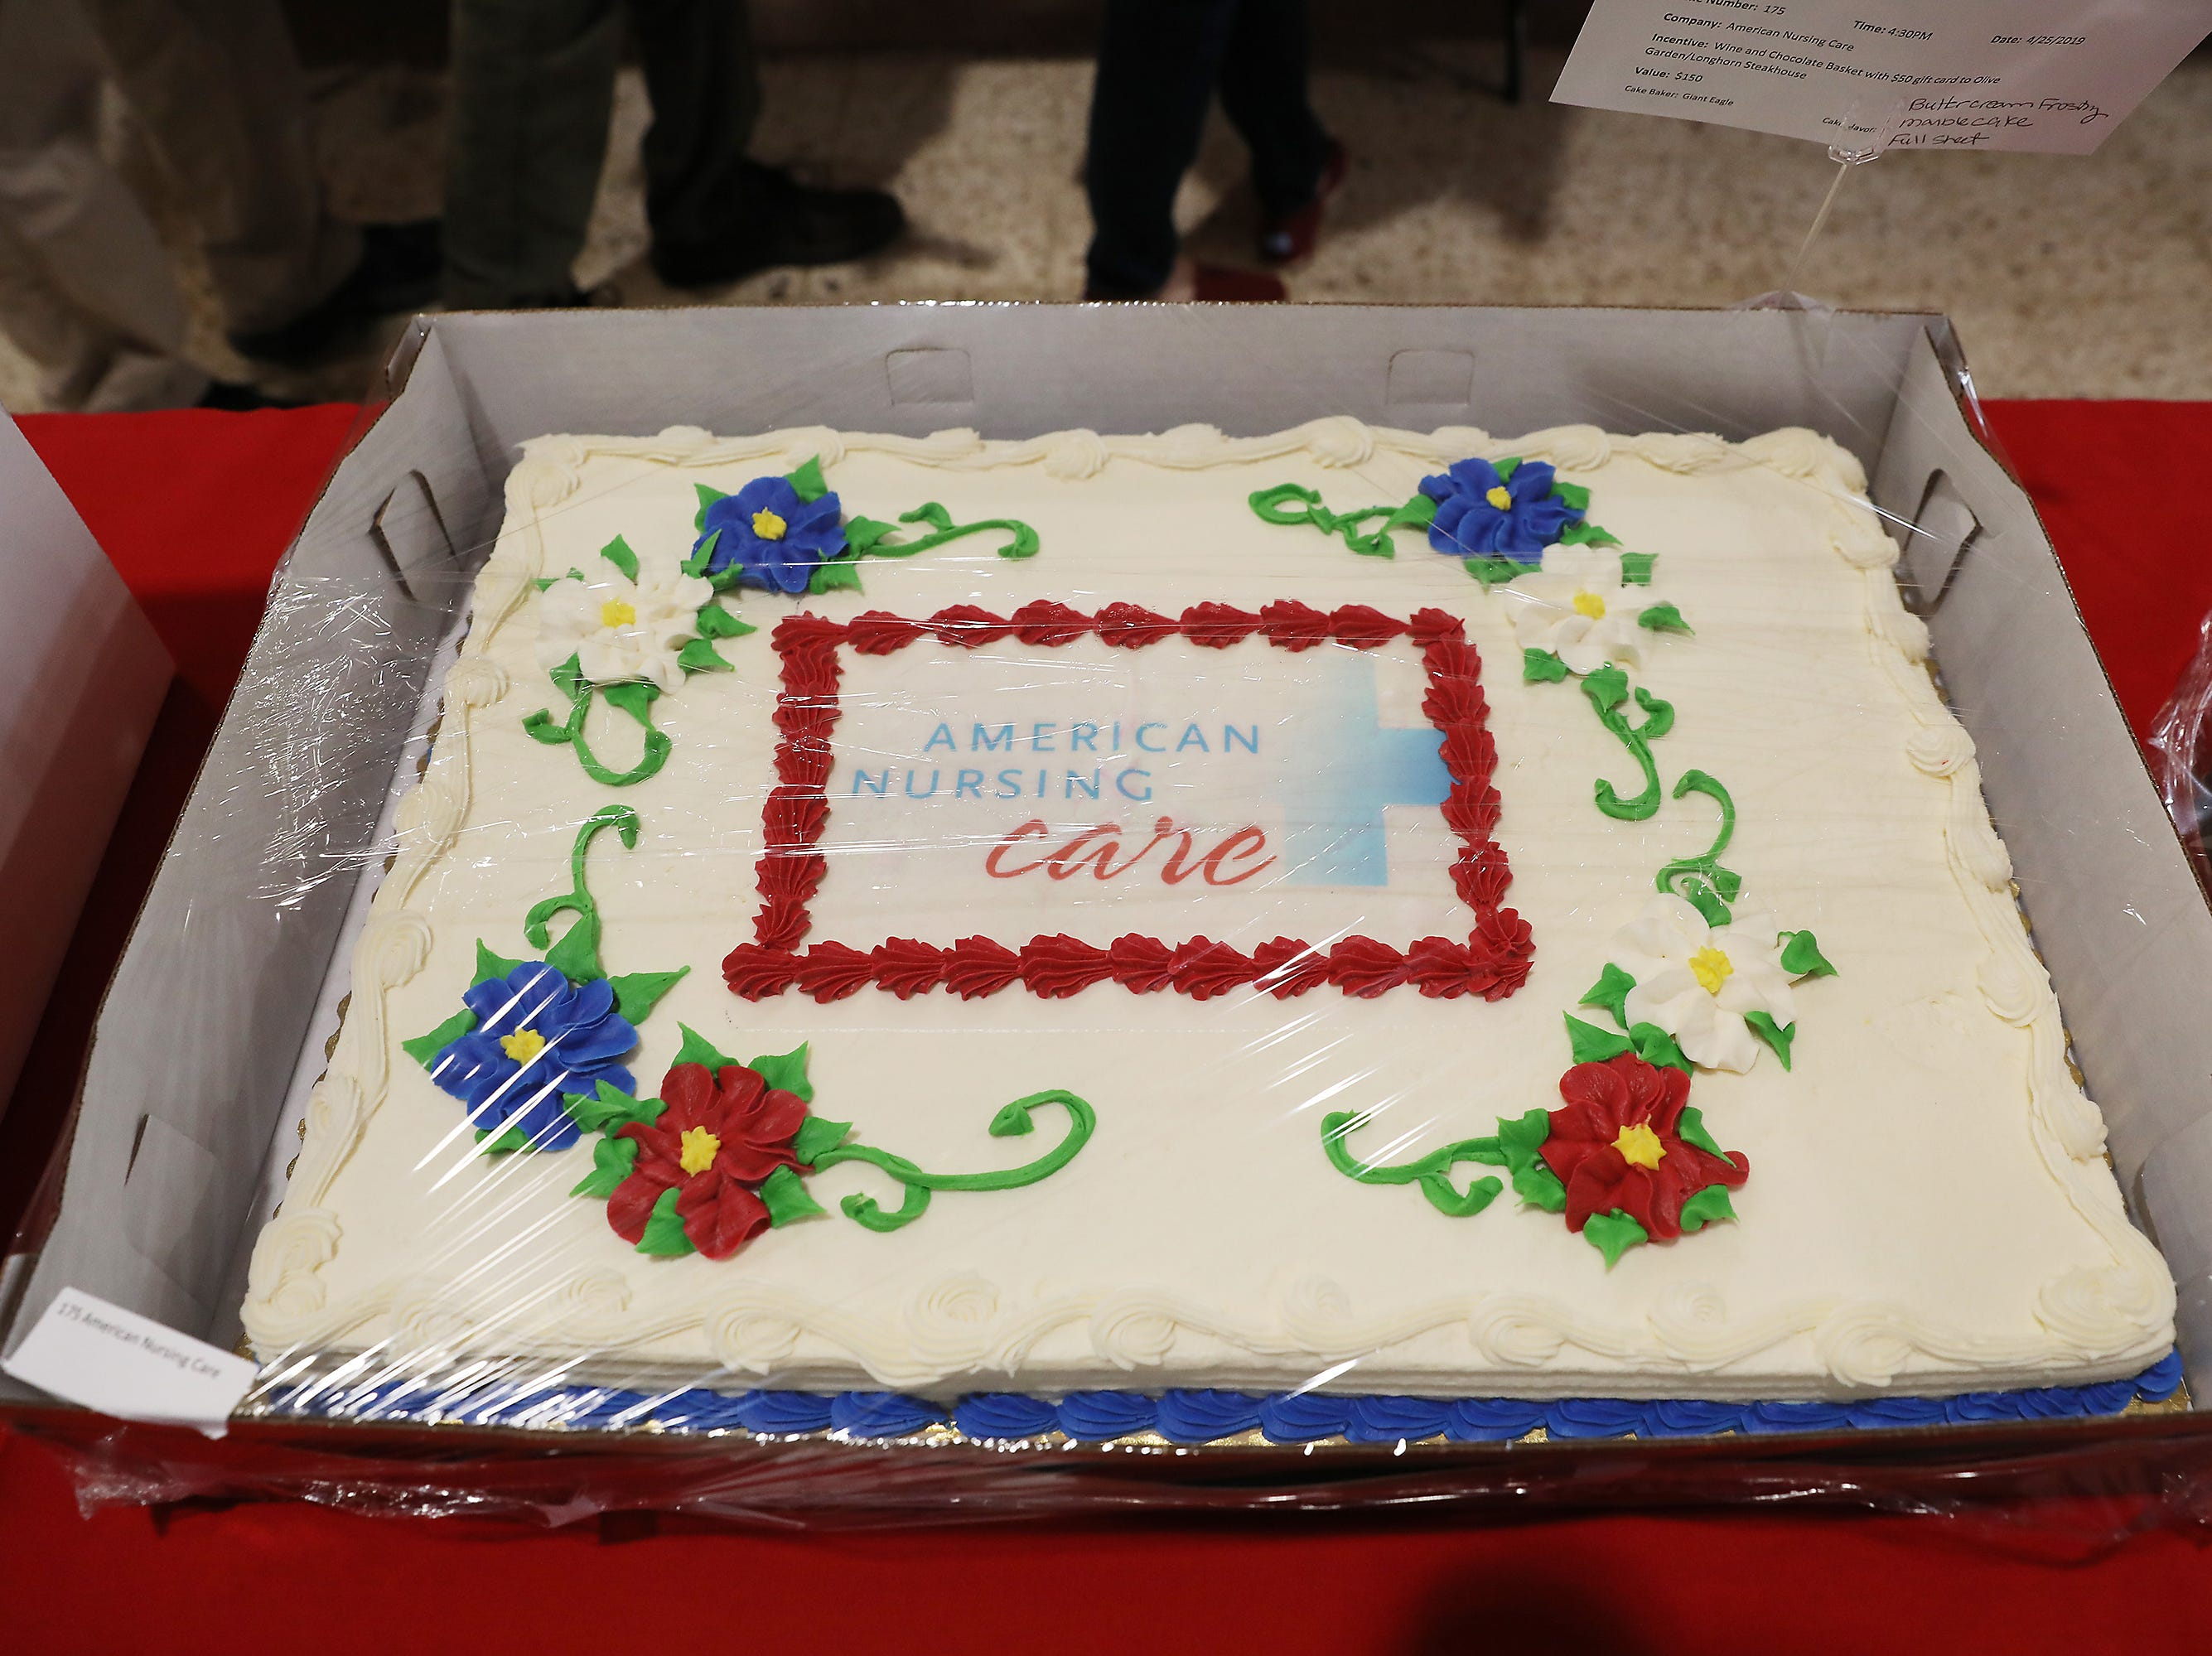 4:30 P.M. Thursday cake 175 American Nursing Care - wine/chocolate Basket, $50 Olive Garden/Longhorn Steakhouse gift card; $150